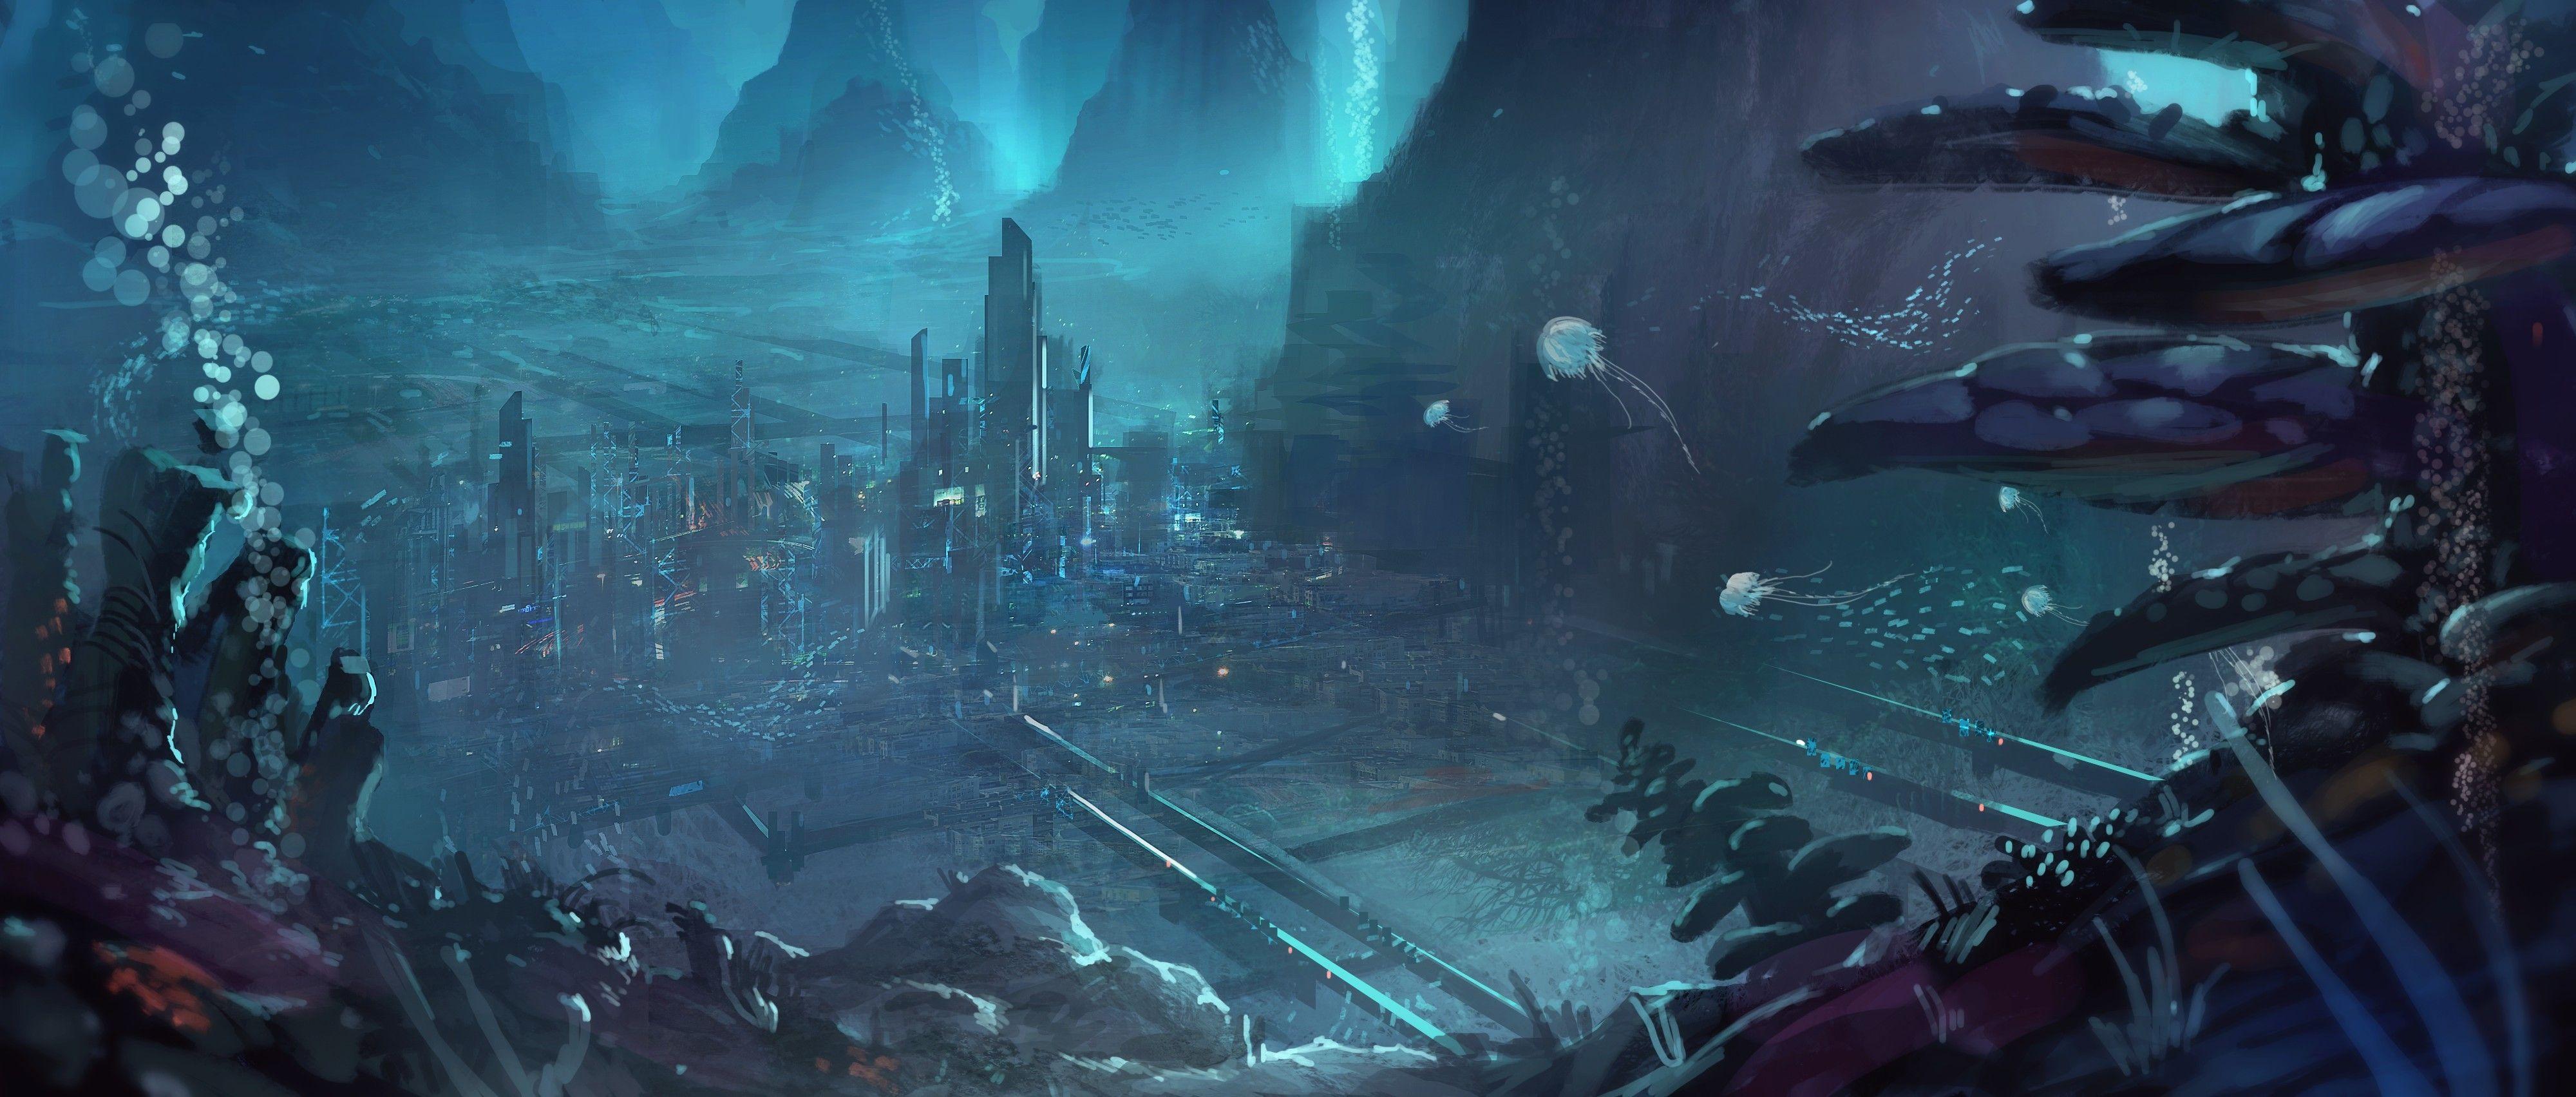 Backgrounds For Alien City